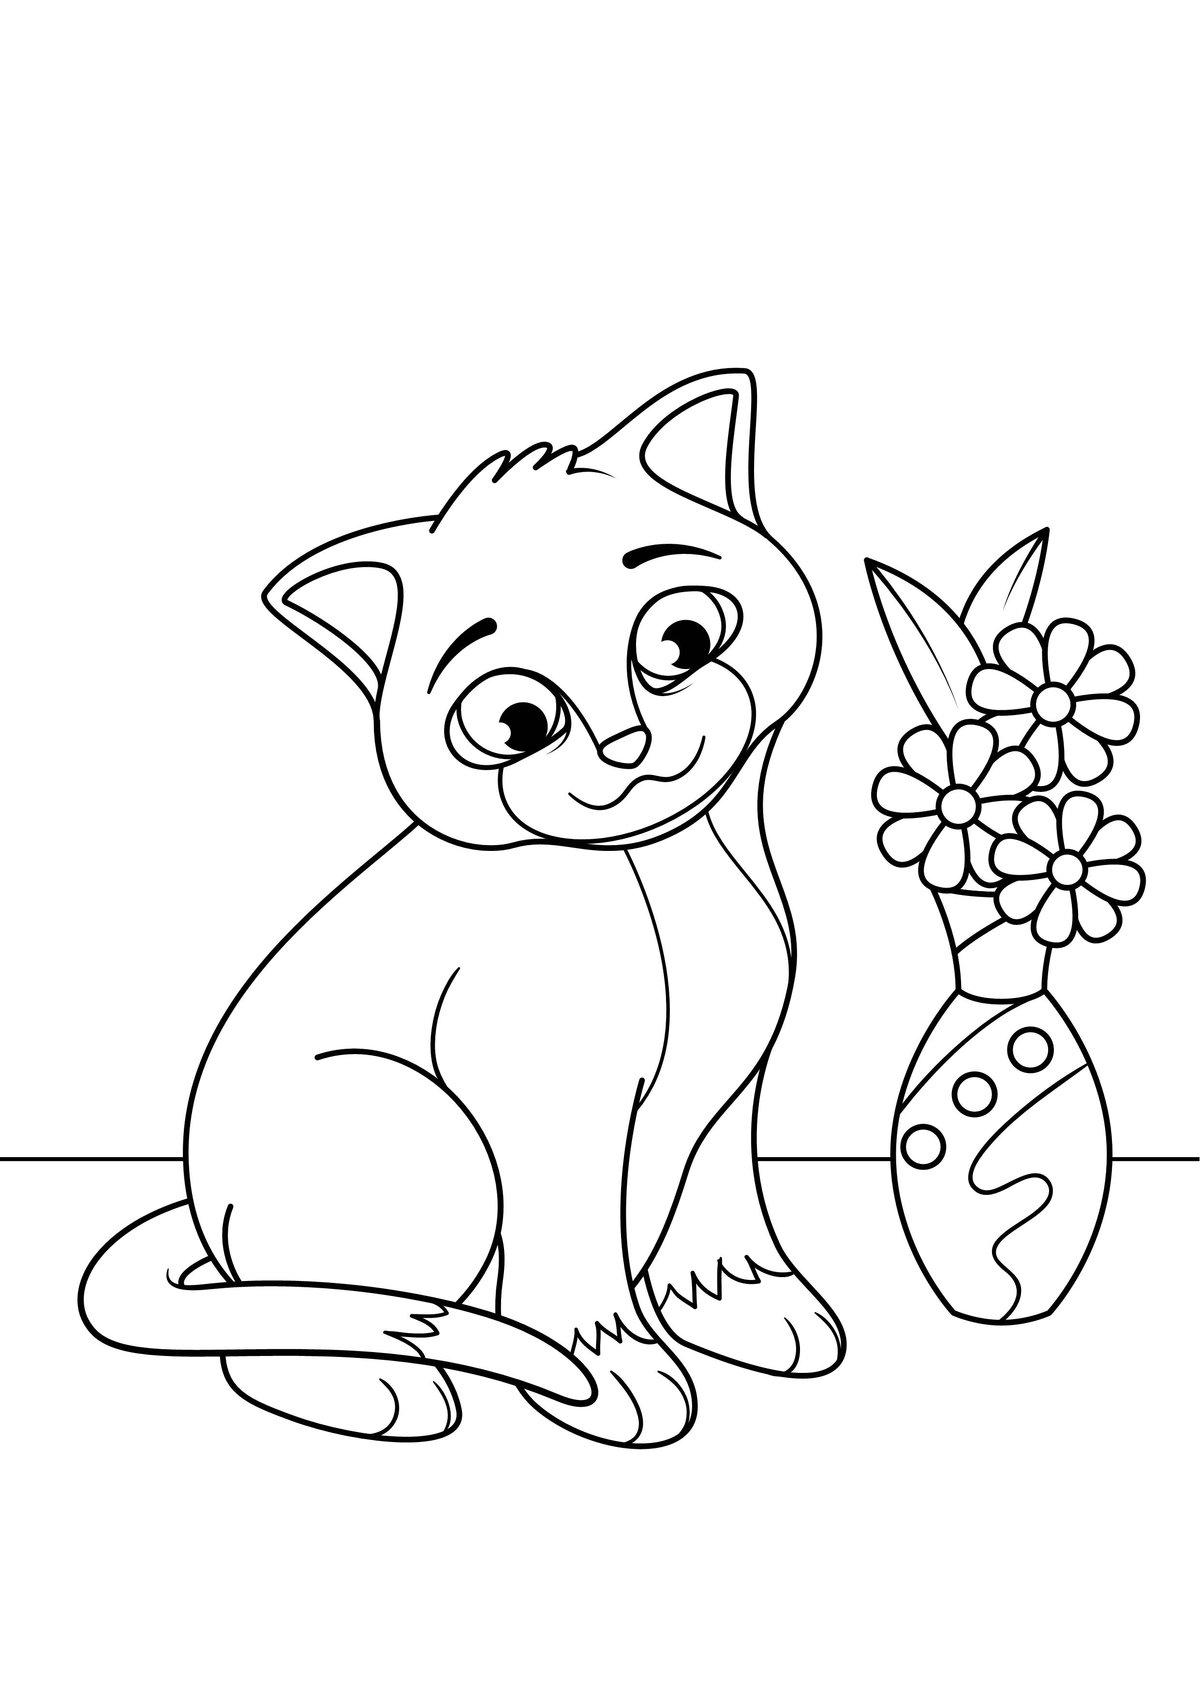 начала картинки раскраски кошки и картинки когда